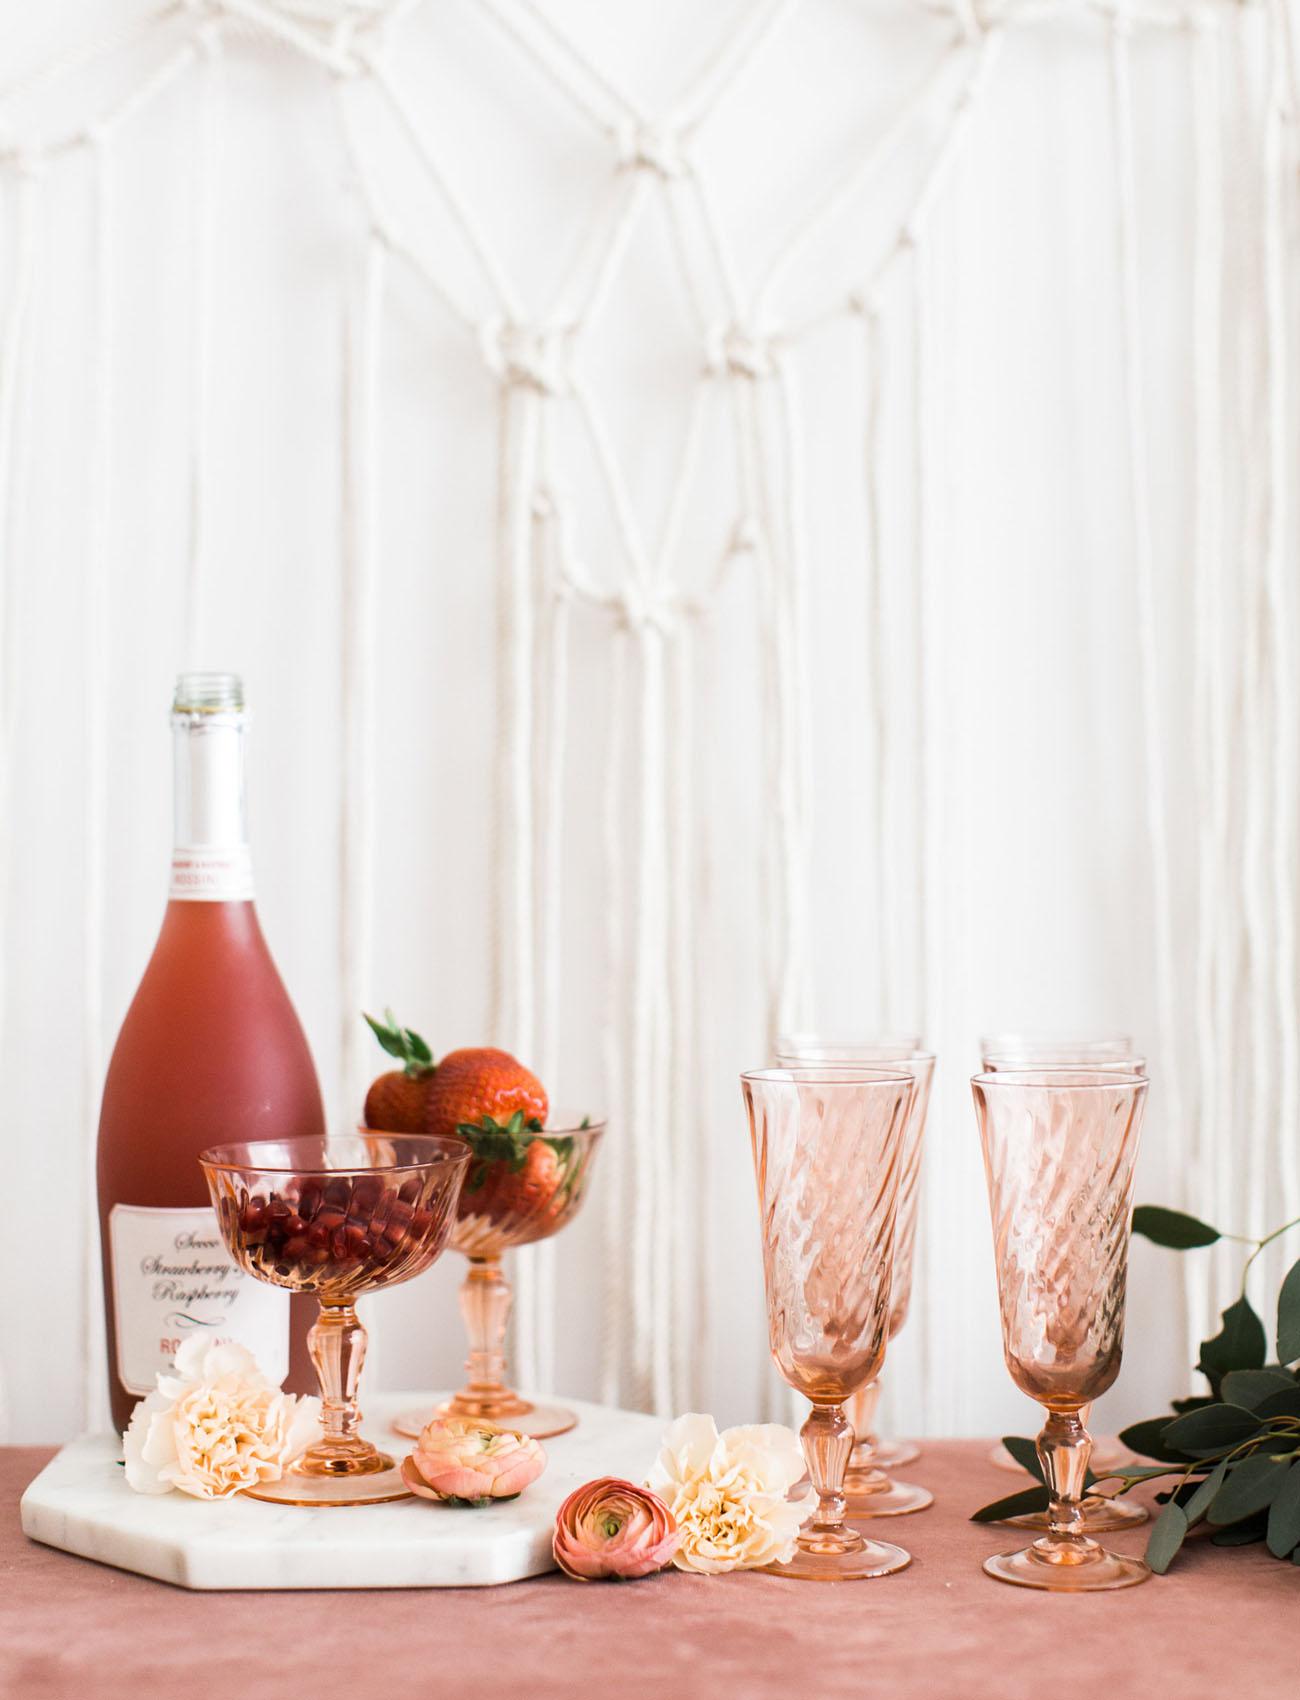 rose drinks